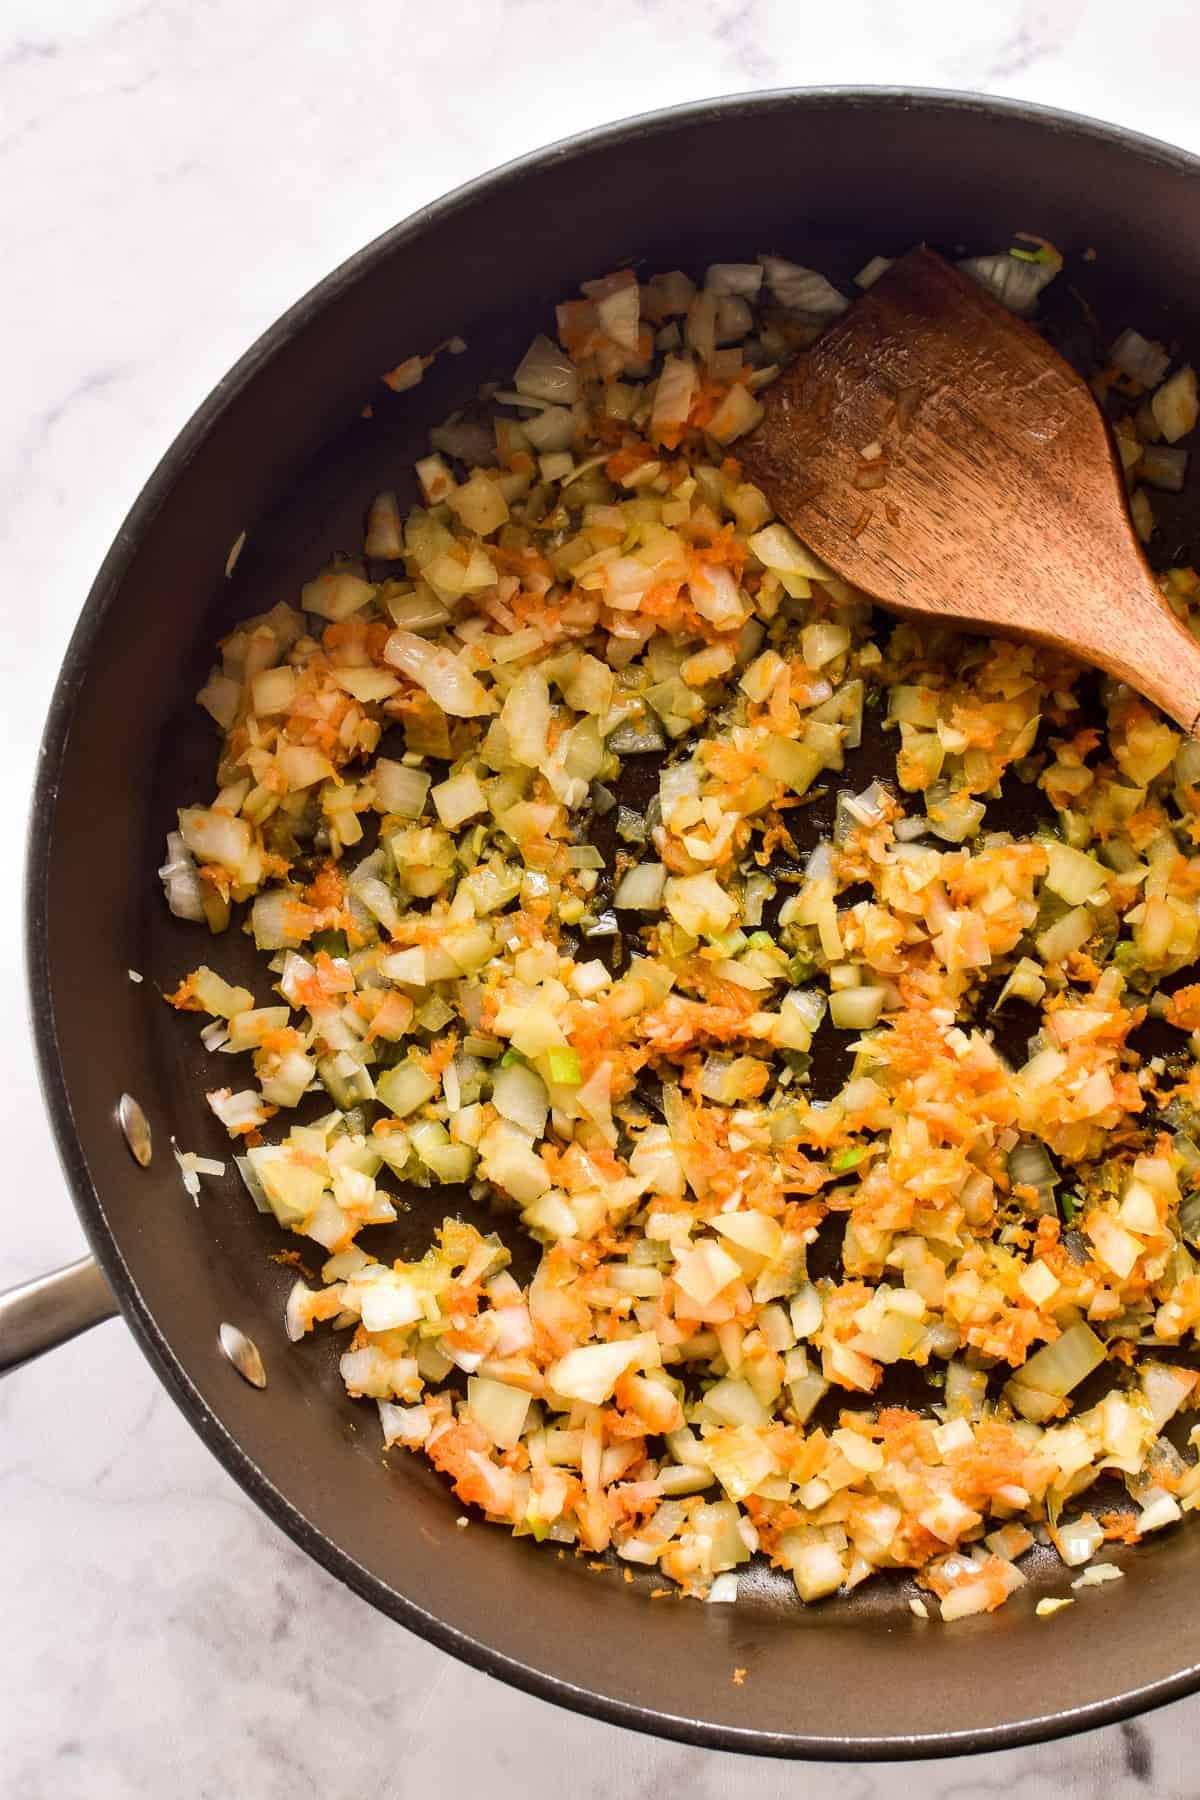 Sautéed onions, garlic, and shredded carrots in a saucepan